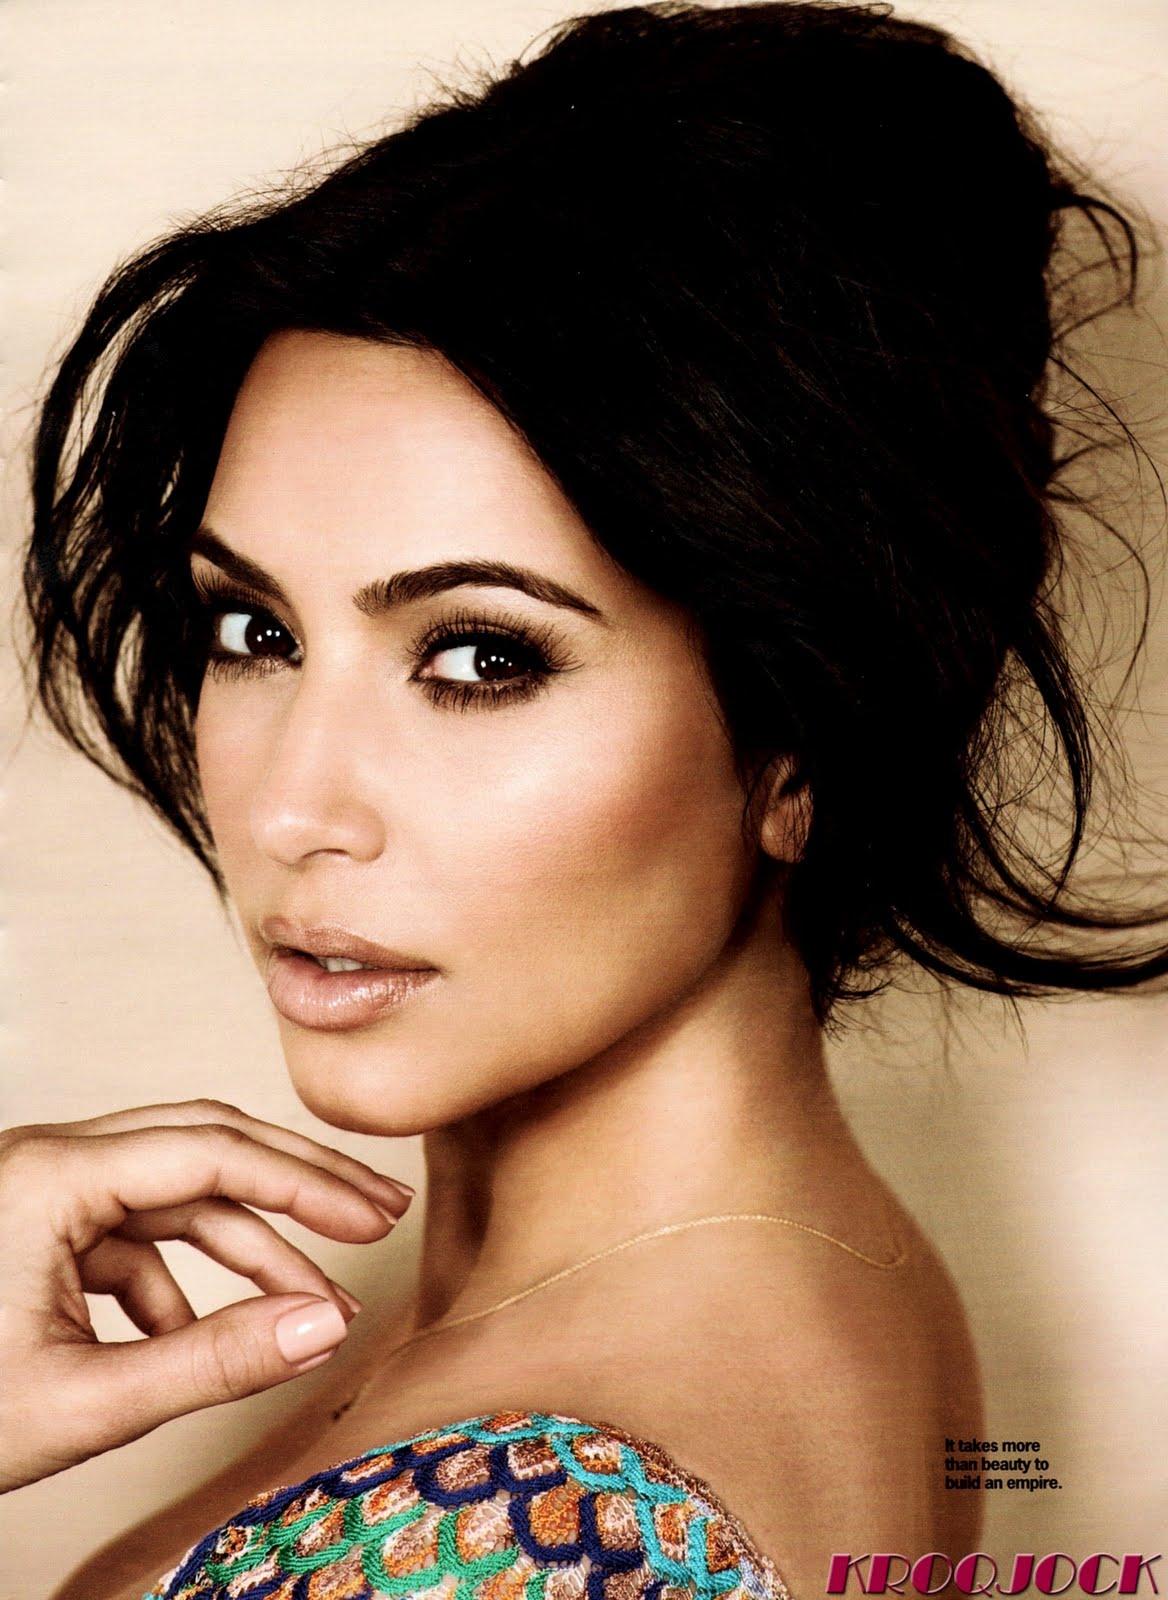 http://2.bp.blogspot.com/-QGFtLul_sZk/ThoY1LIo2RI/AAAAAAAAPBs/_2O9EZduQh0/s1600/Kim-Kardashian-12.jpg